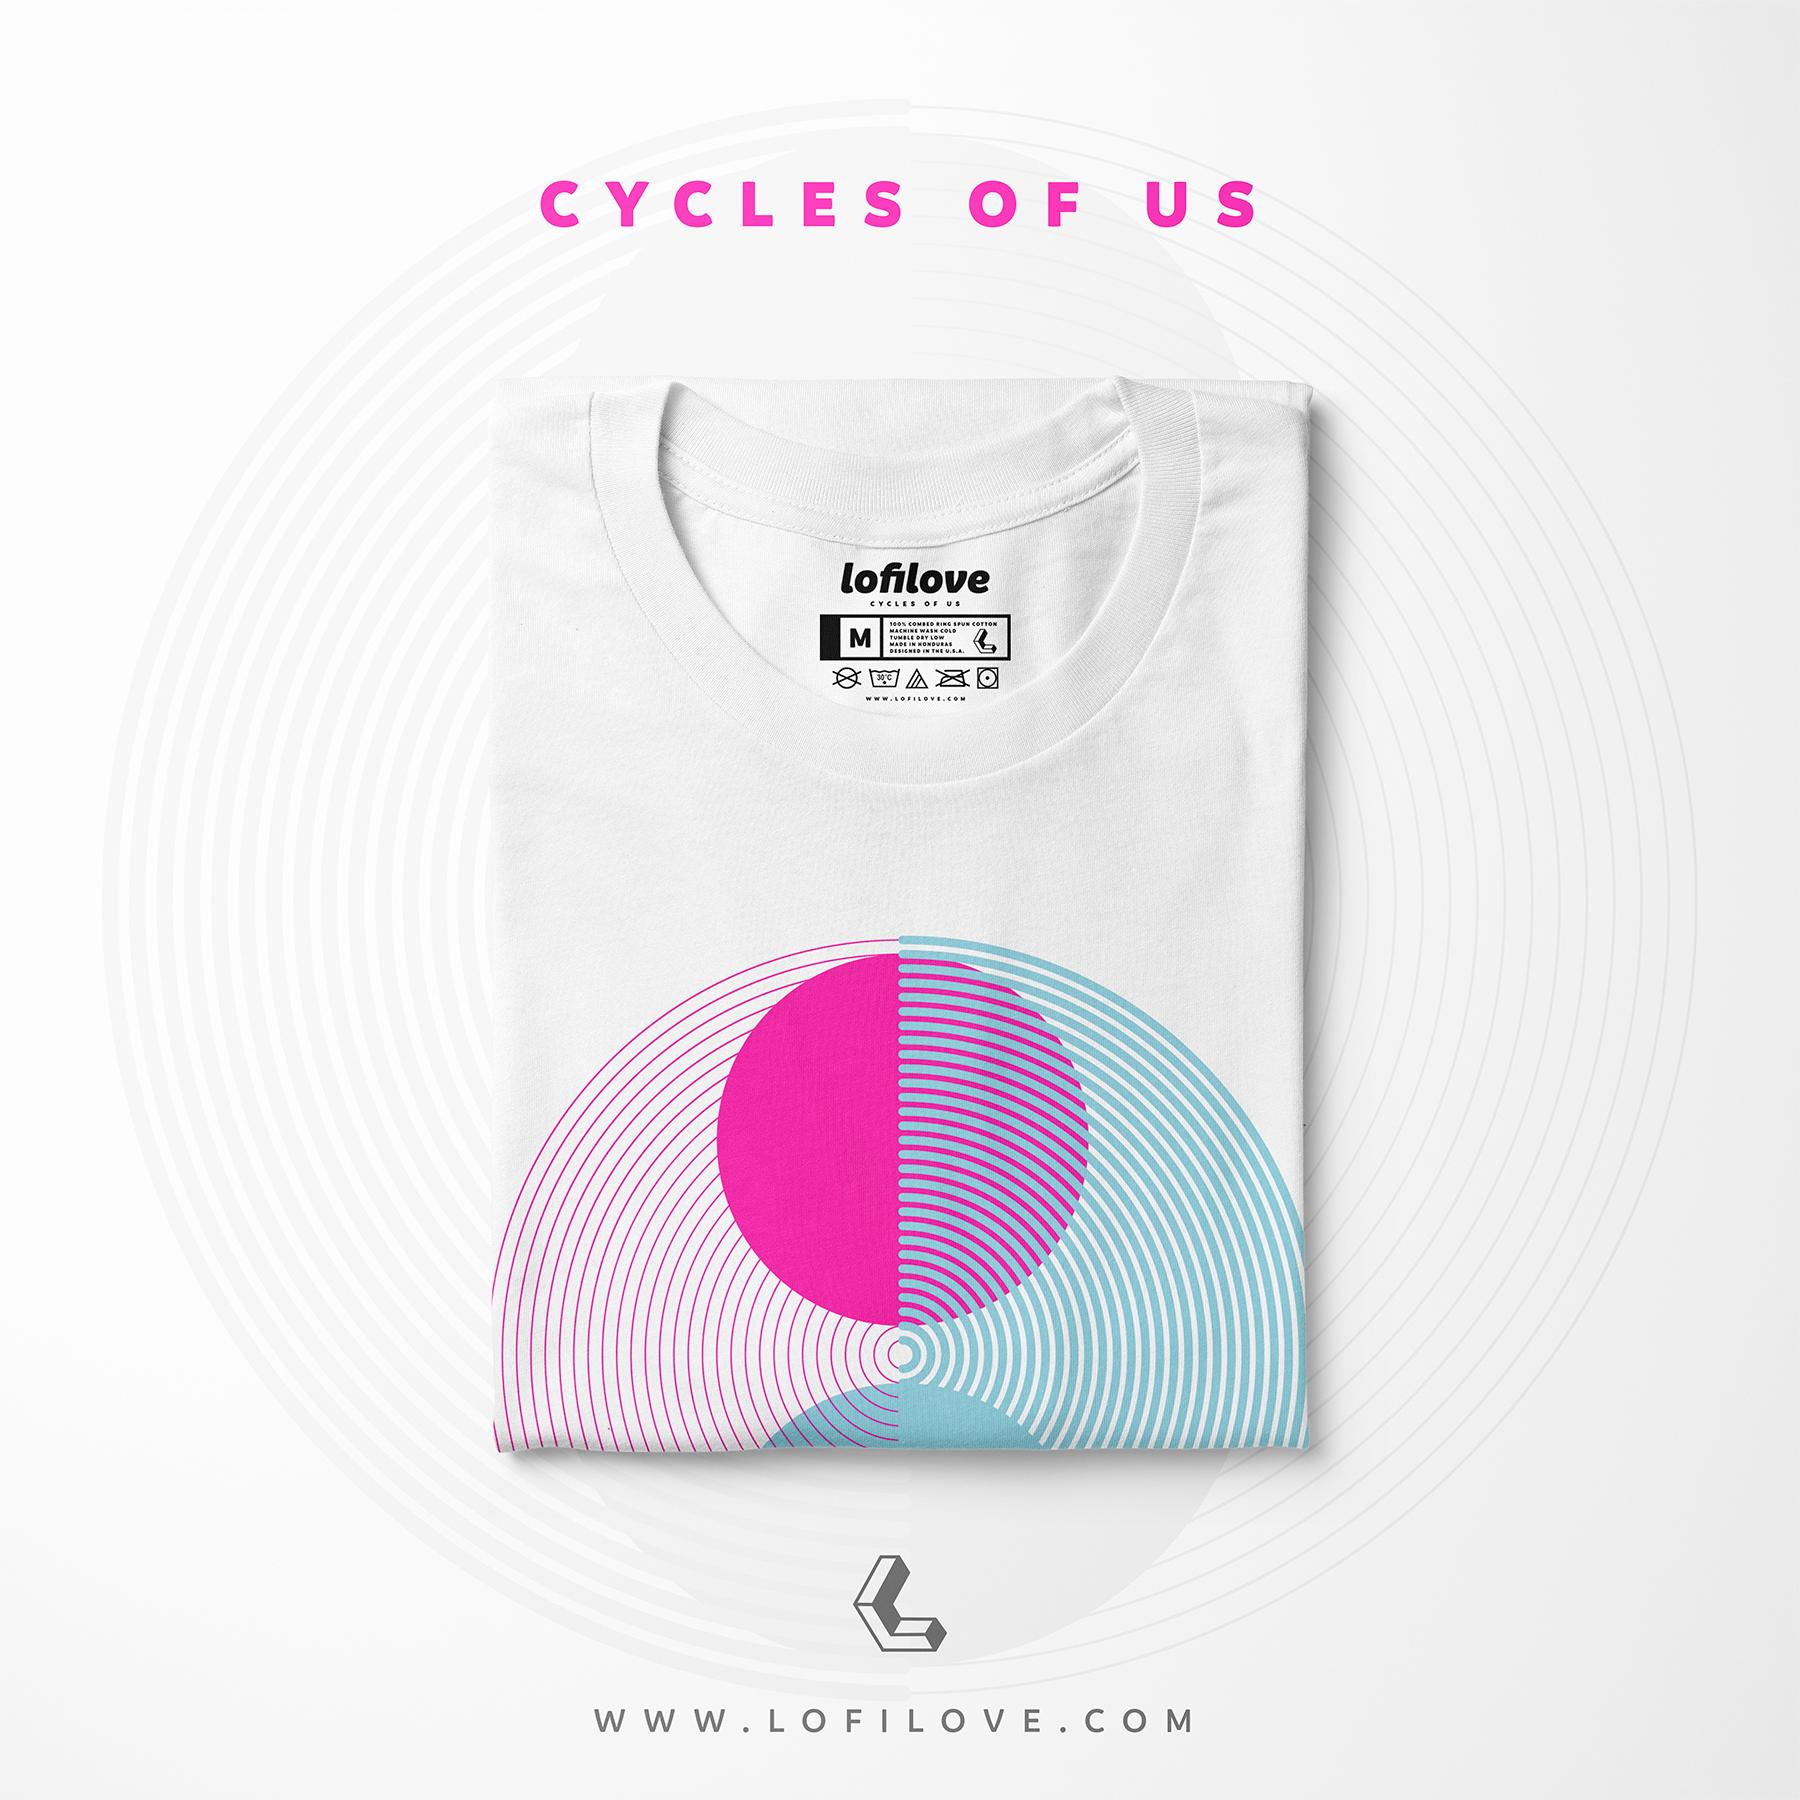 lofilove-cycles-of-us-tee-2